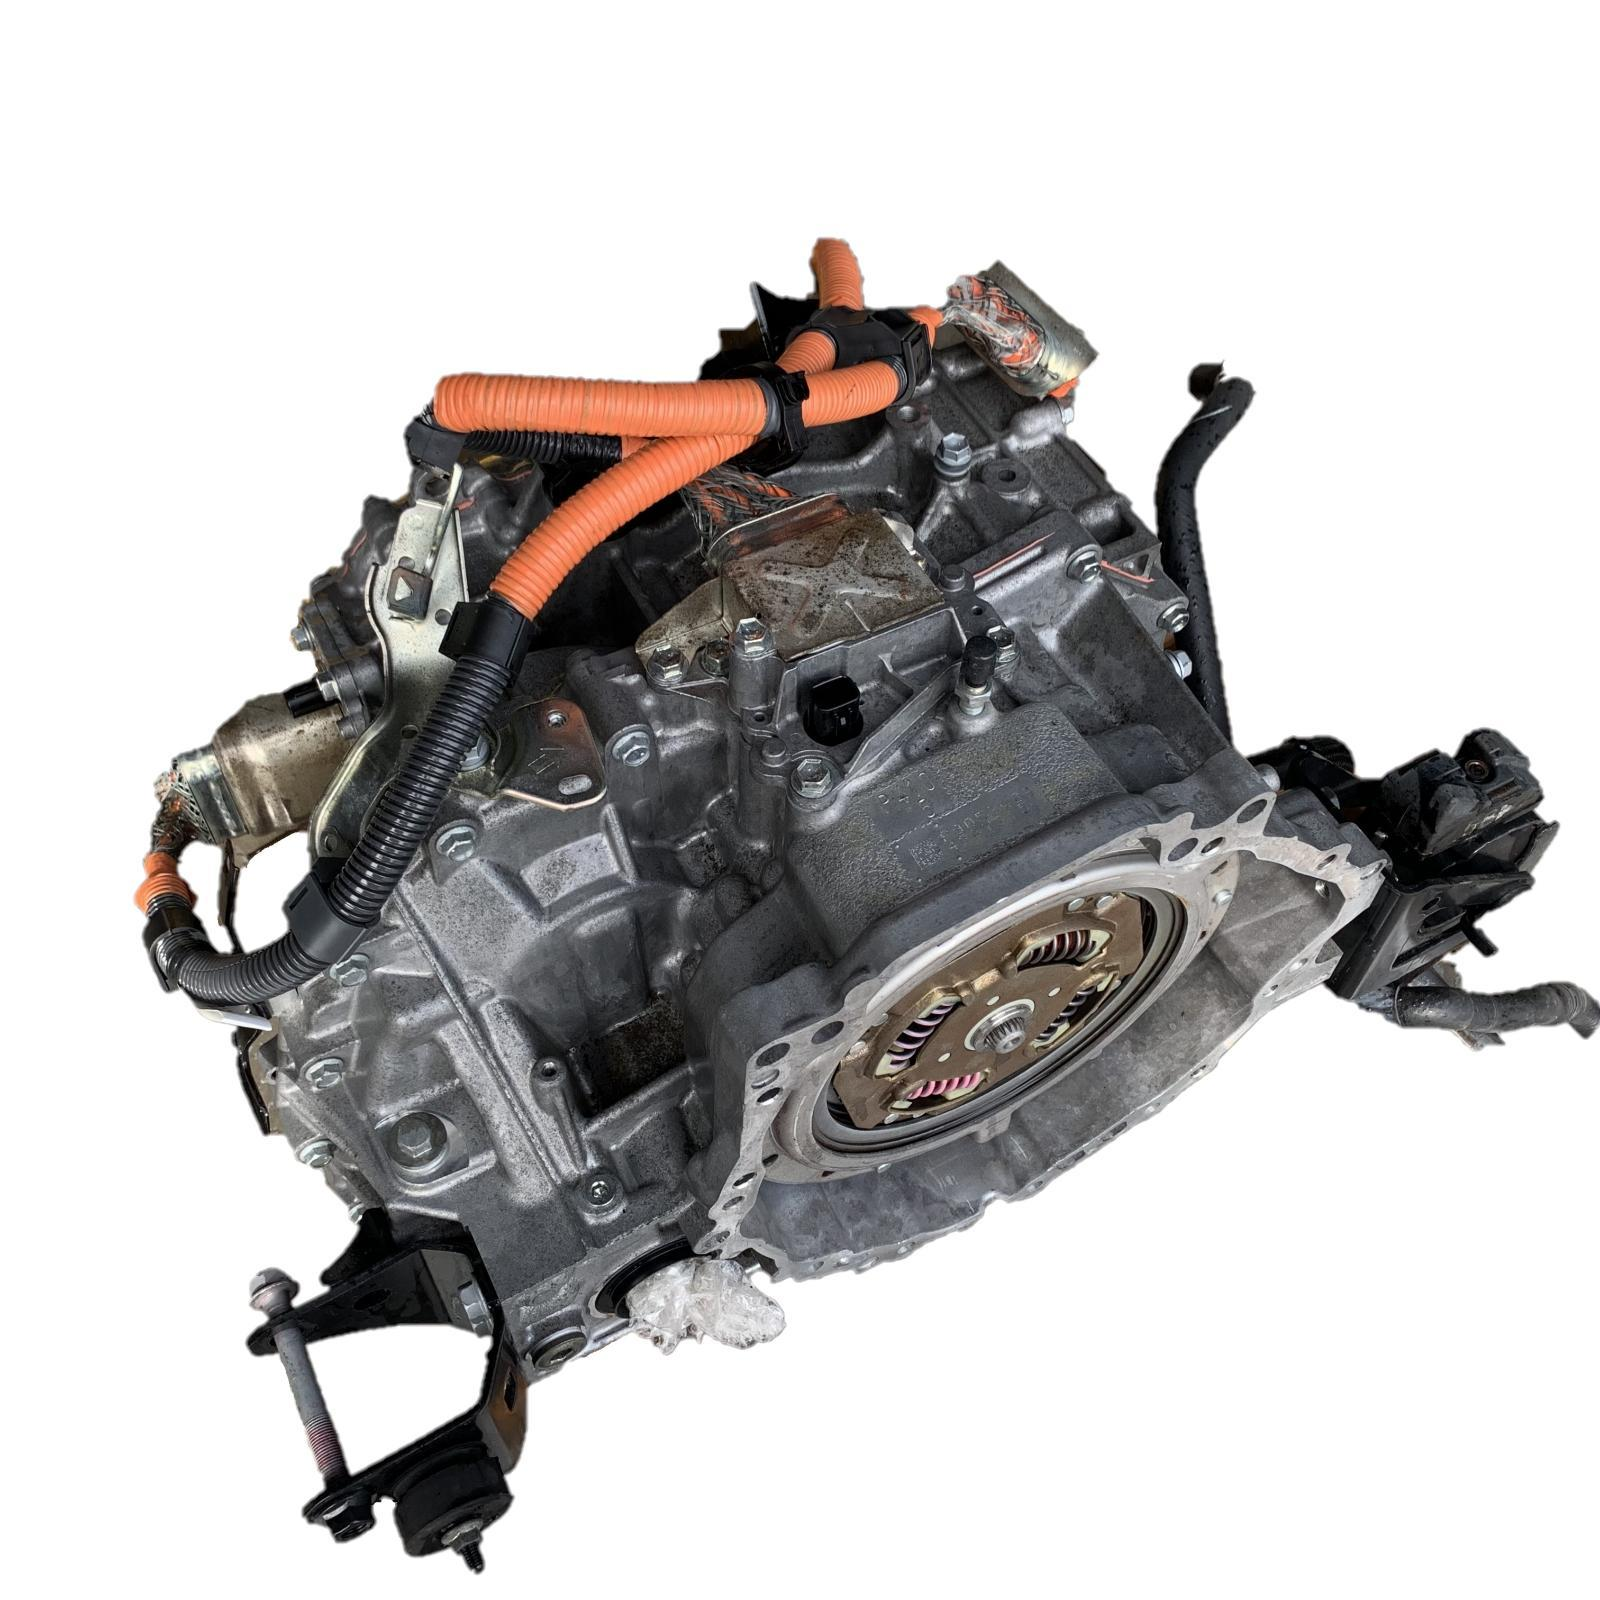 TOYOTA PRIUS, Trans/Gearbox, AUTO, 1.8, 2ZR-FXE, ZVW30R, 07/09-12/15